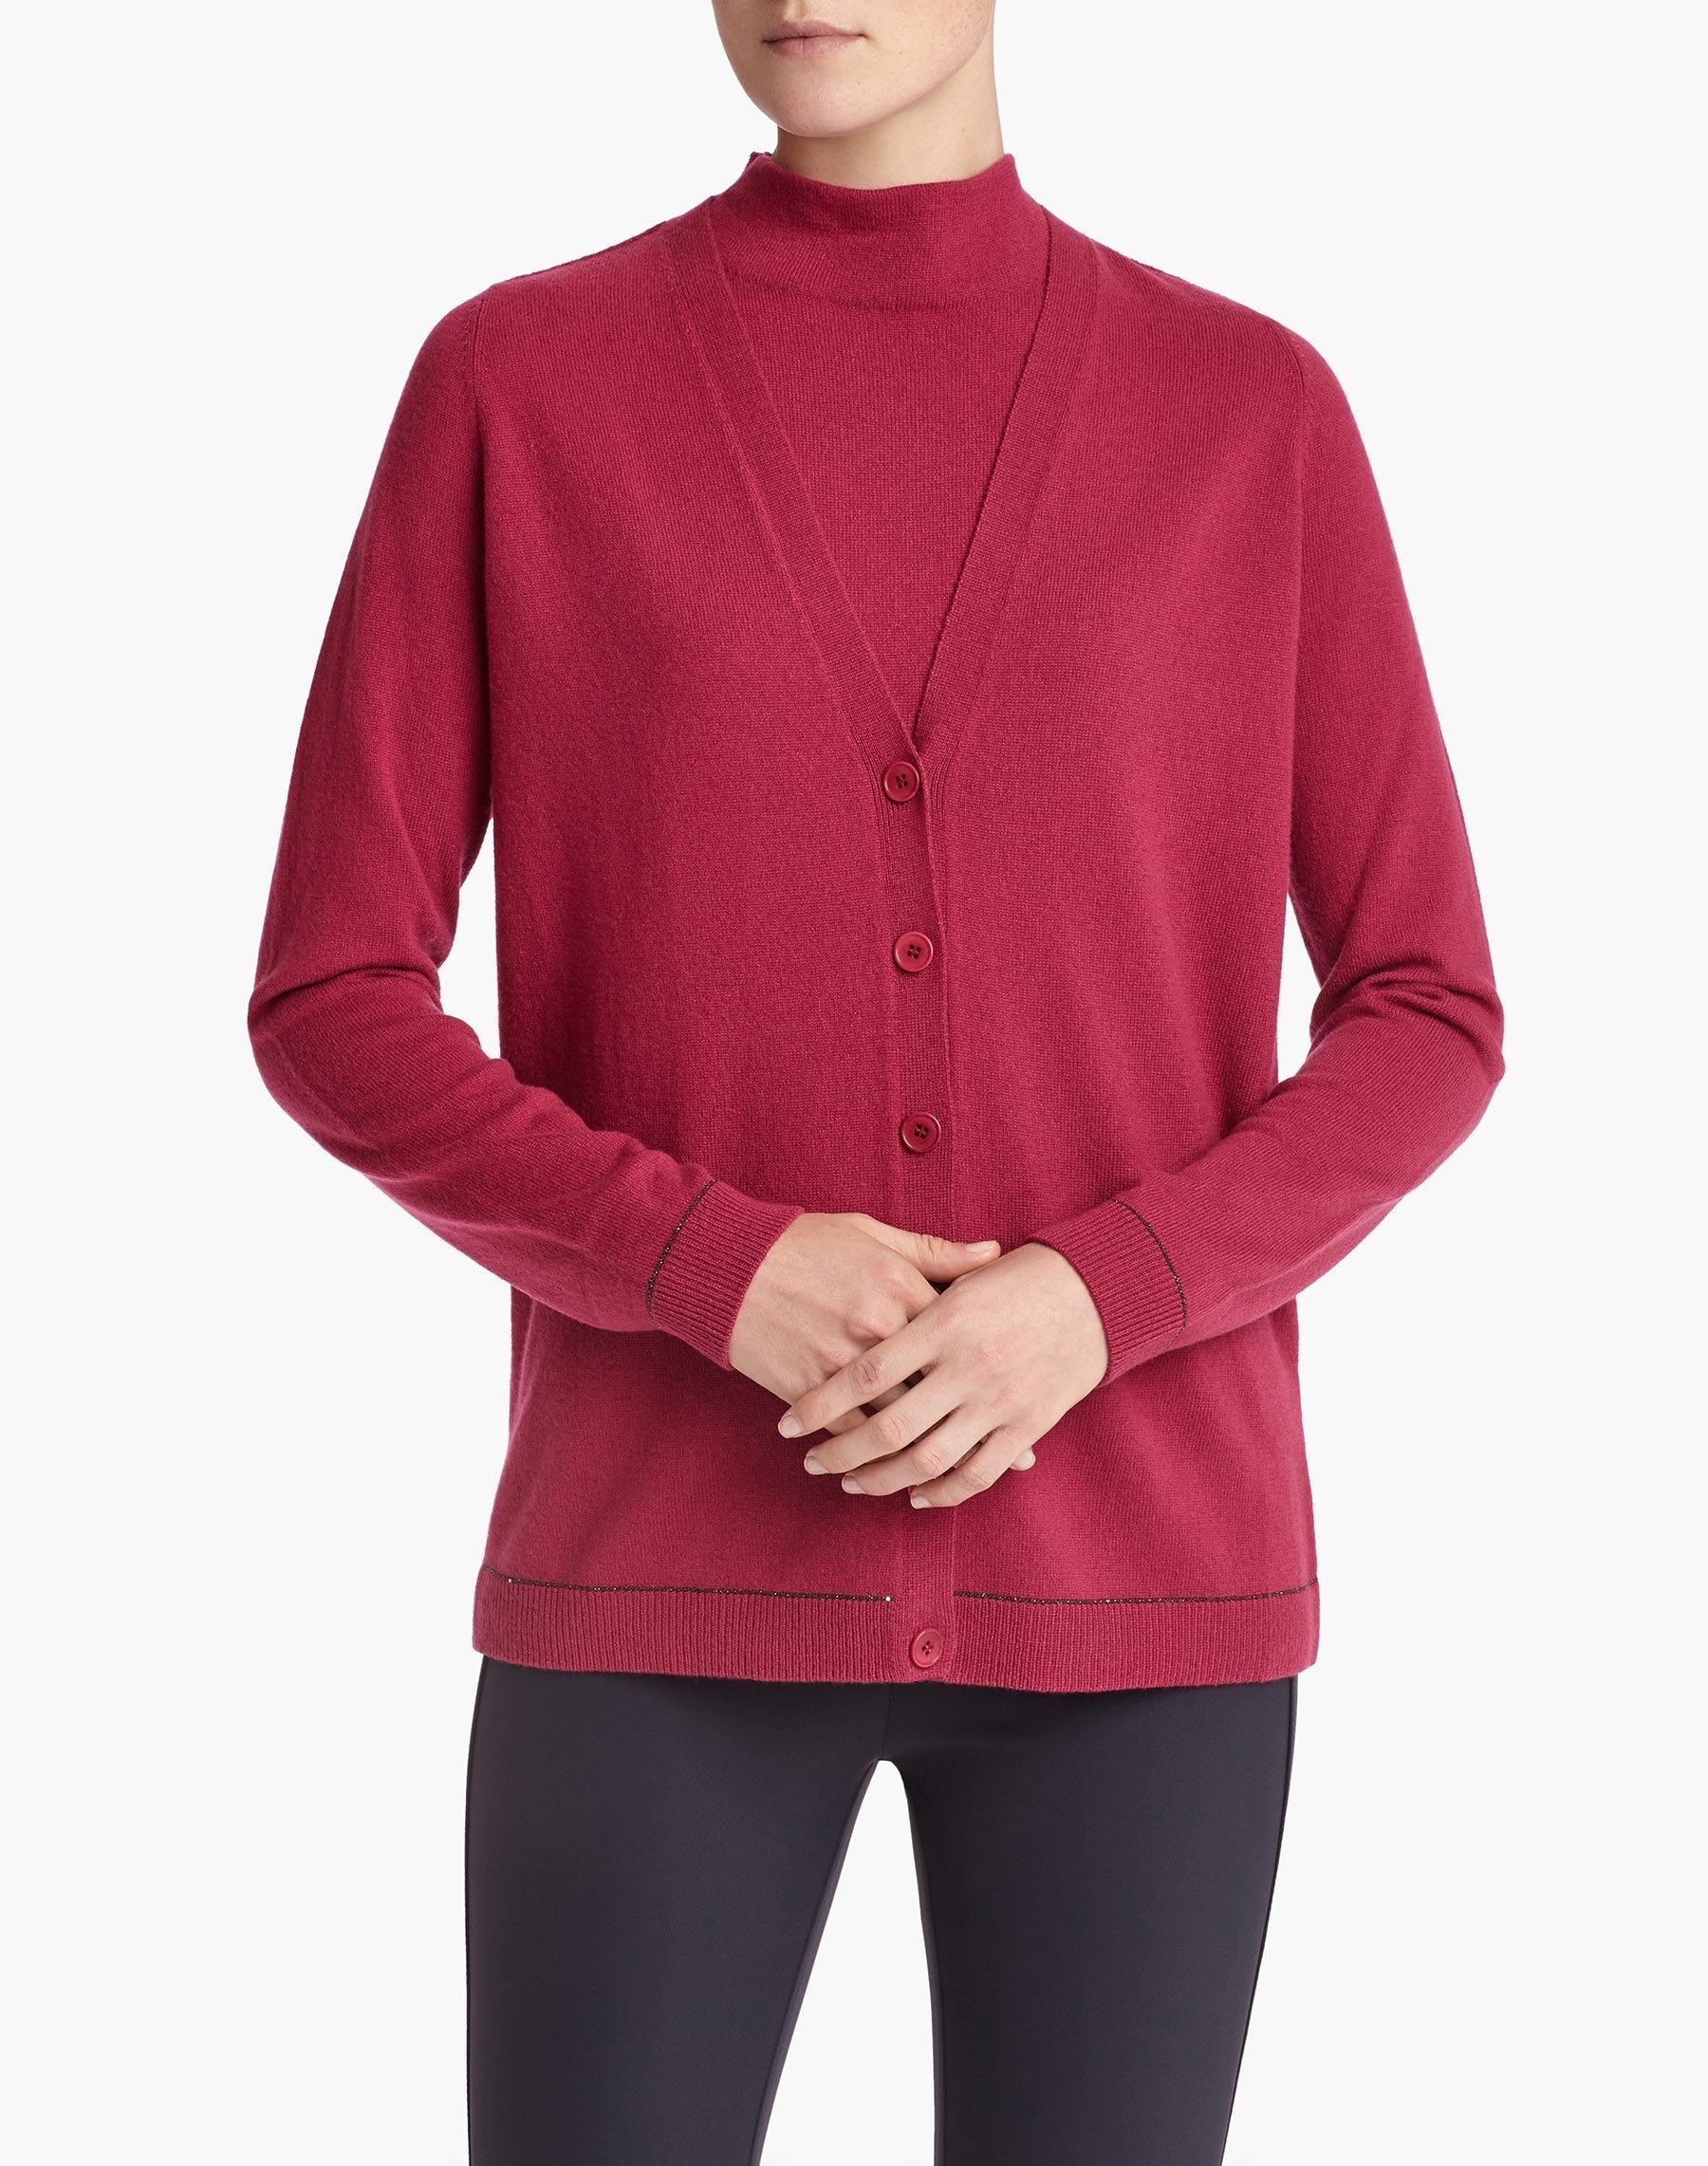 Plus-Size Cashmere Sequin Trim Cardigan | Lafayette 148 New York